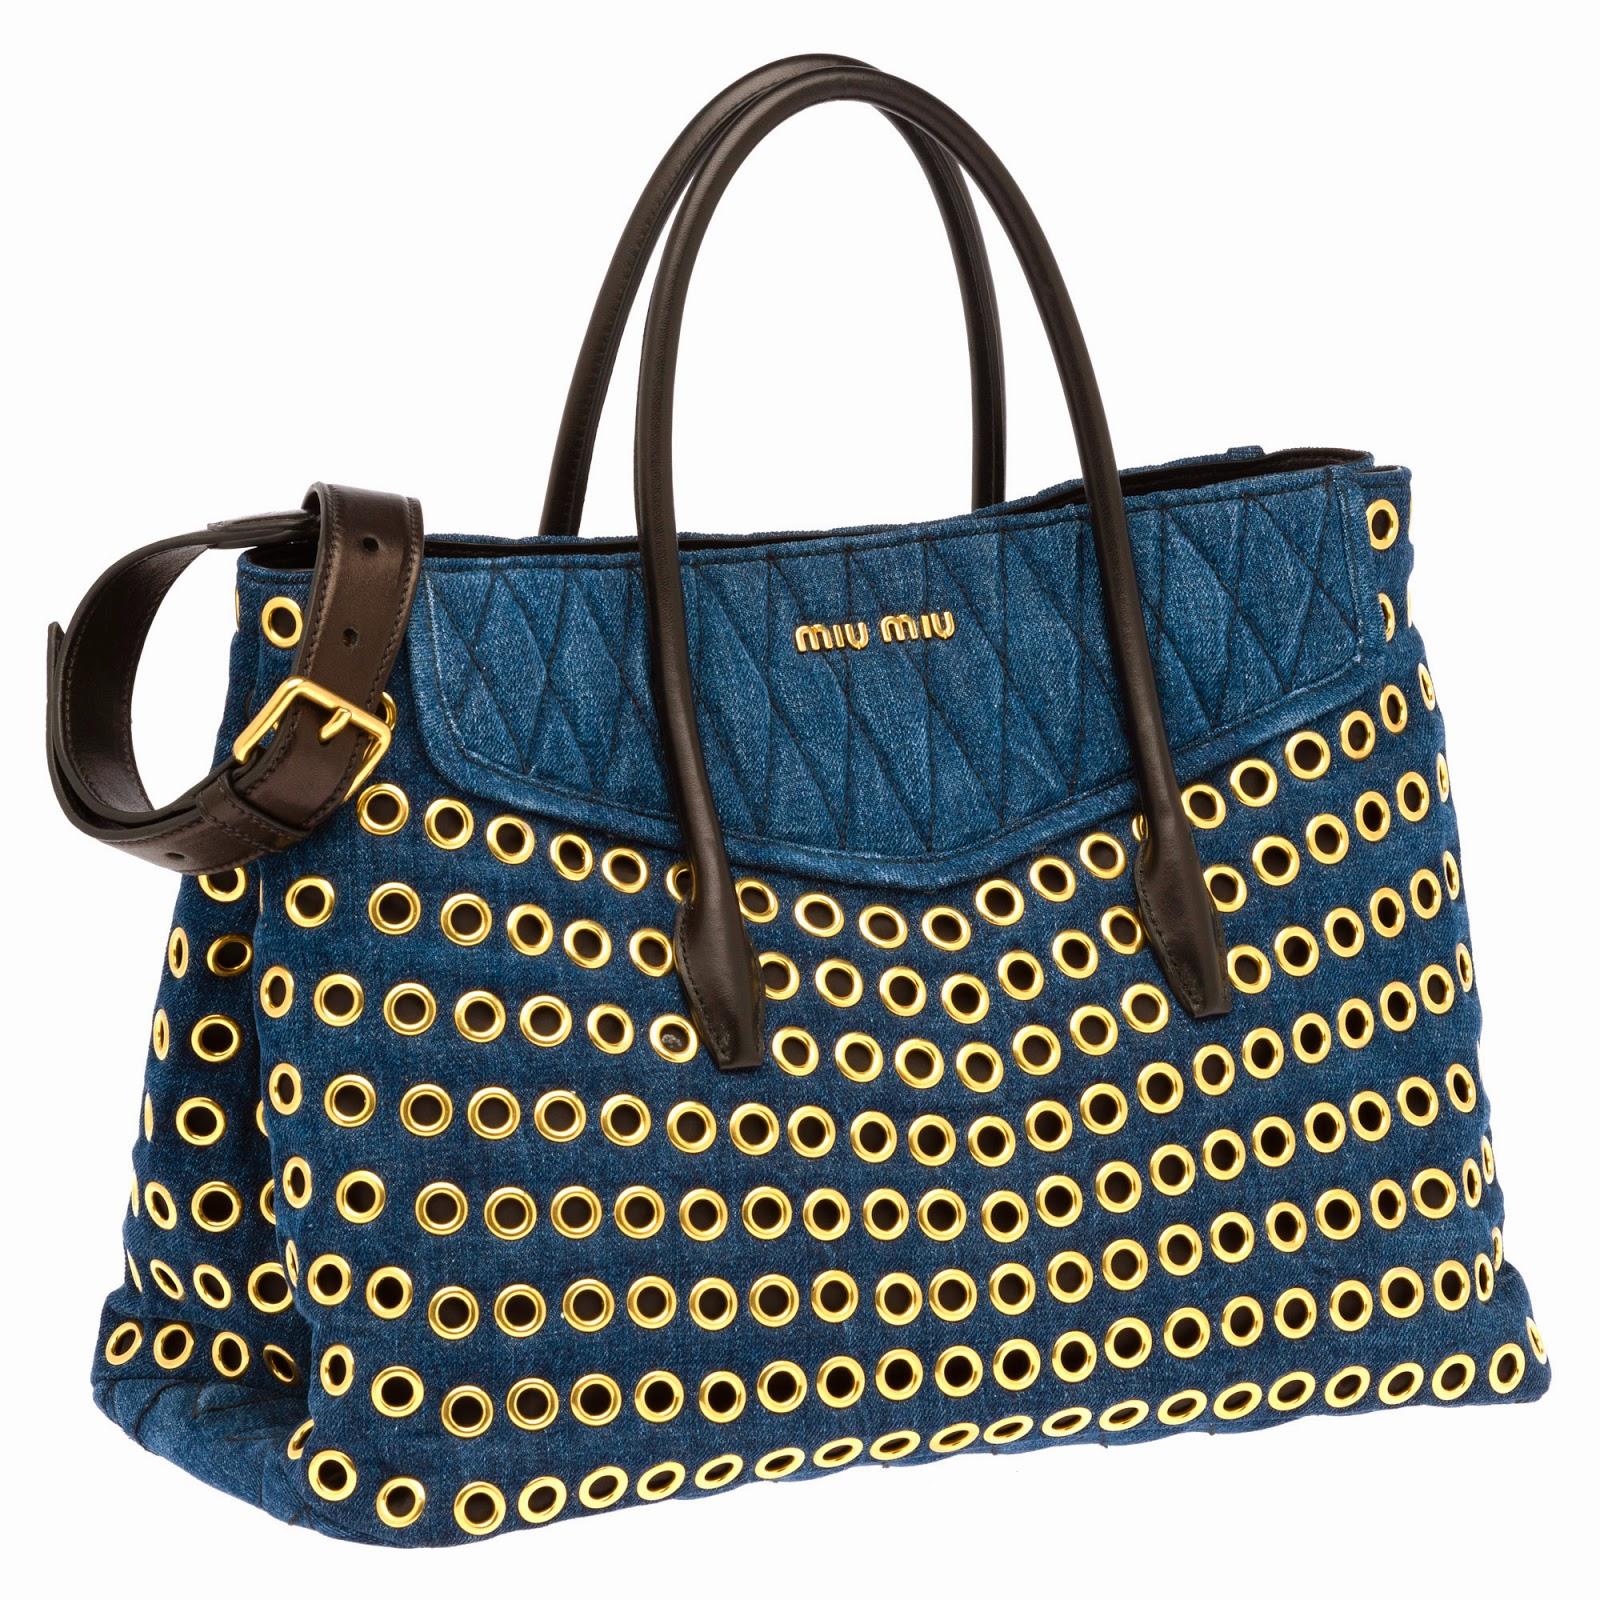 raptiyeli+tote Miu Miu Herbst Winter 2014 Handtaschen Modelle